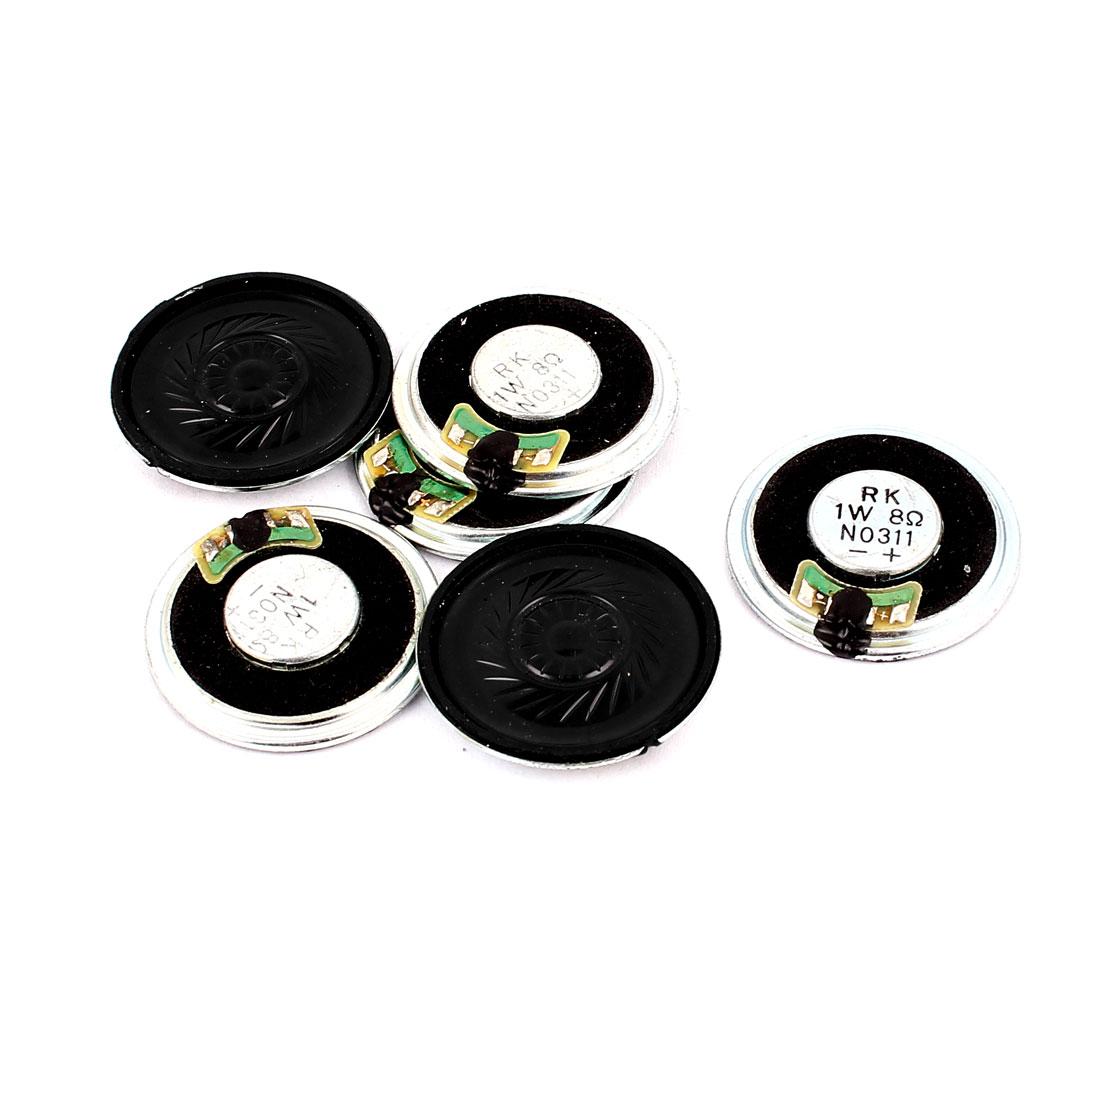 1W 36mm Diameter 8 Ohm Internal Mini Magnet Speaker Loudspeaker 6Pcs